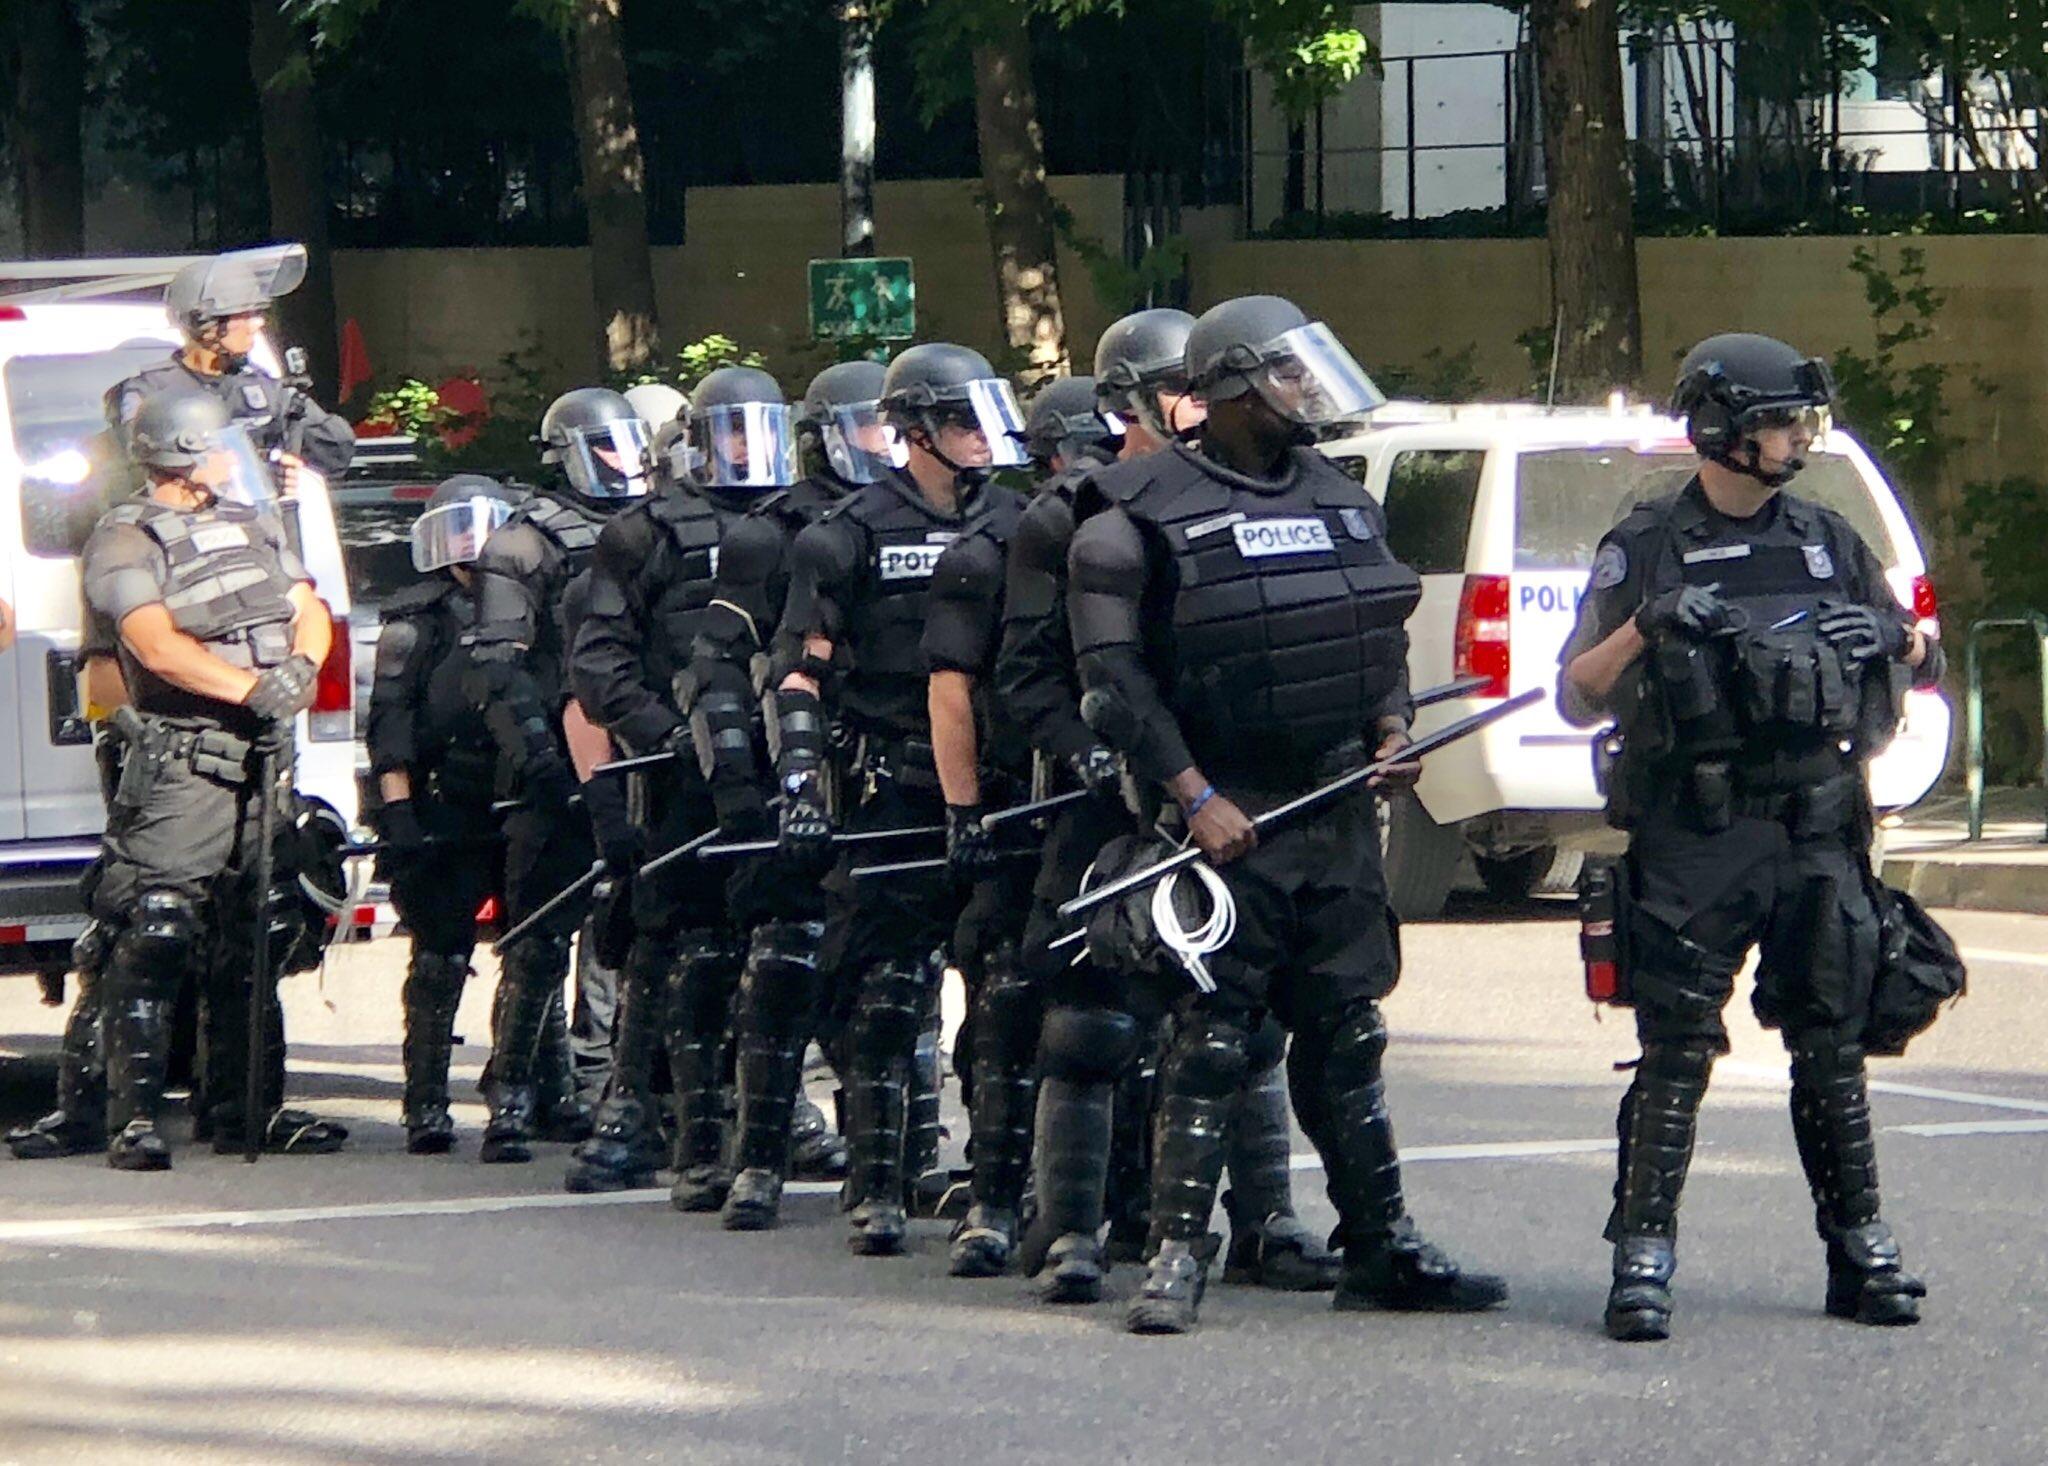 The Portland Police Bureau in riot gear on June 30, 2018 — photo Jeff Thomas Black